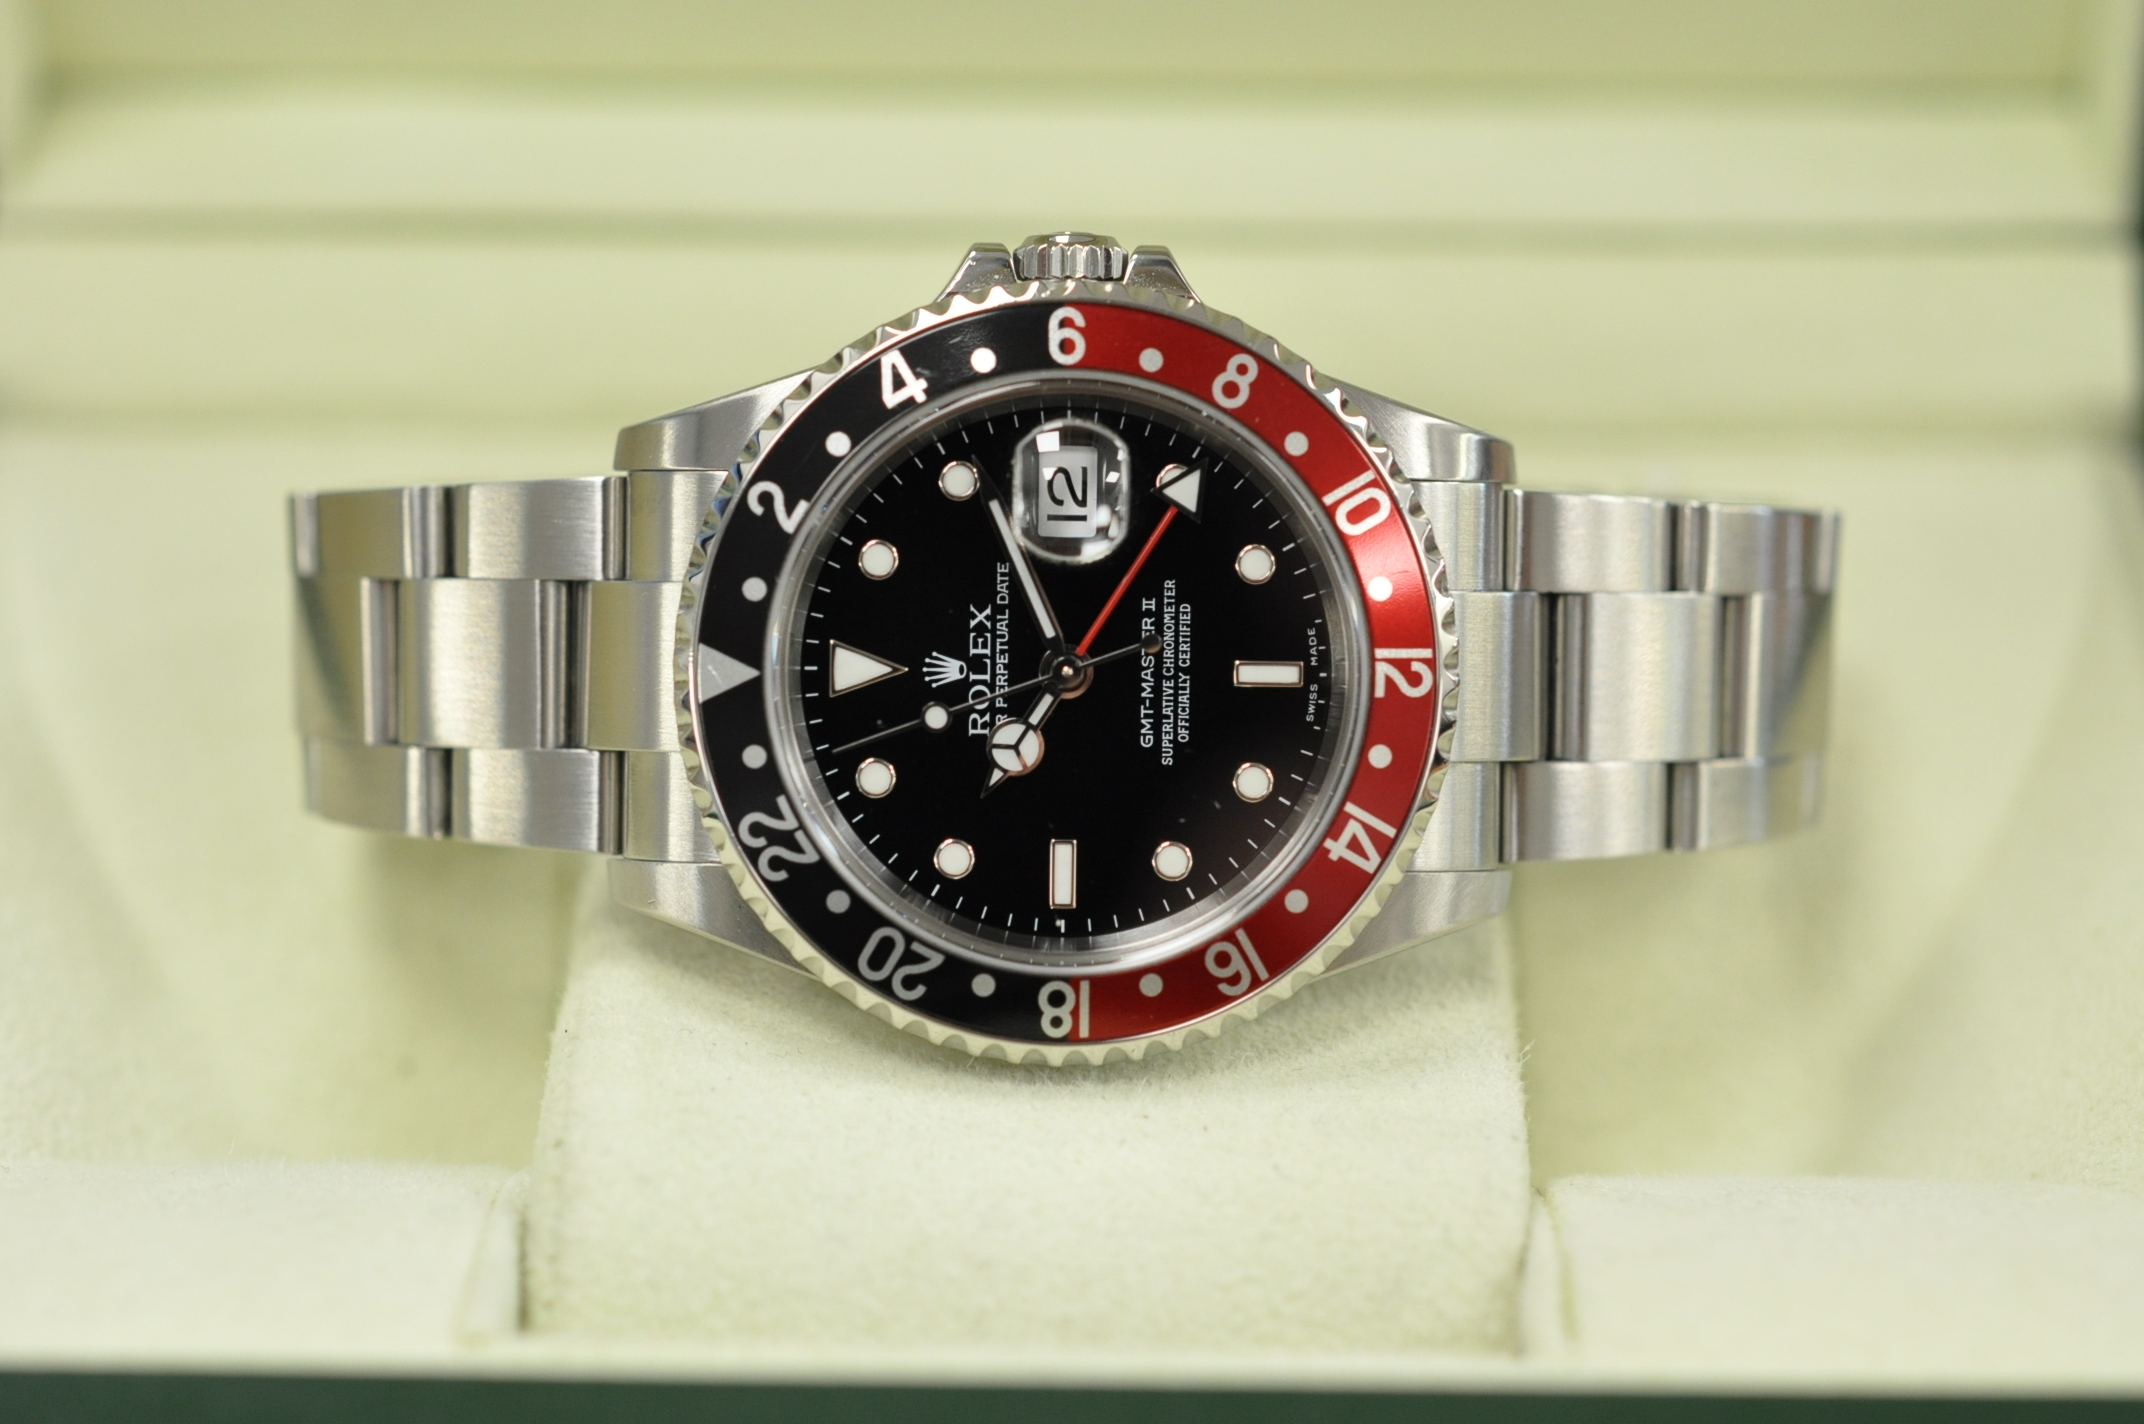 2005 GMT-Master II 16710